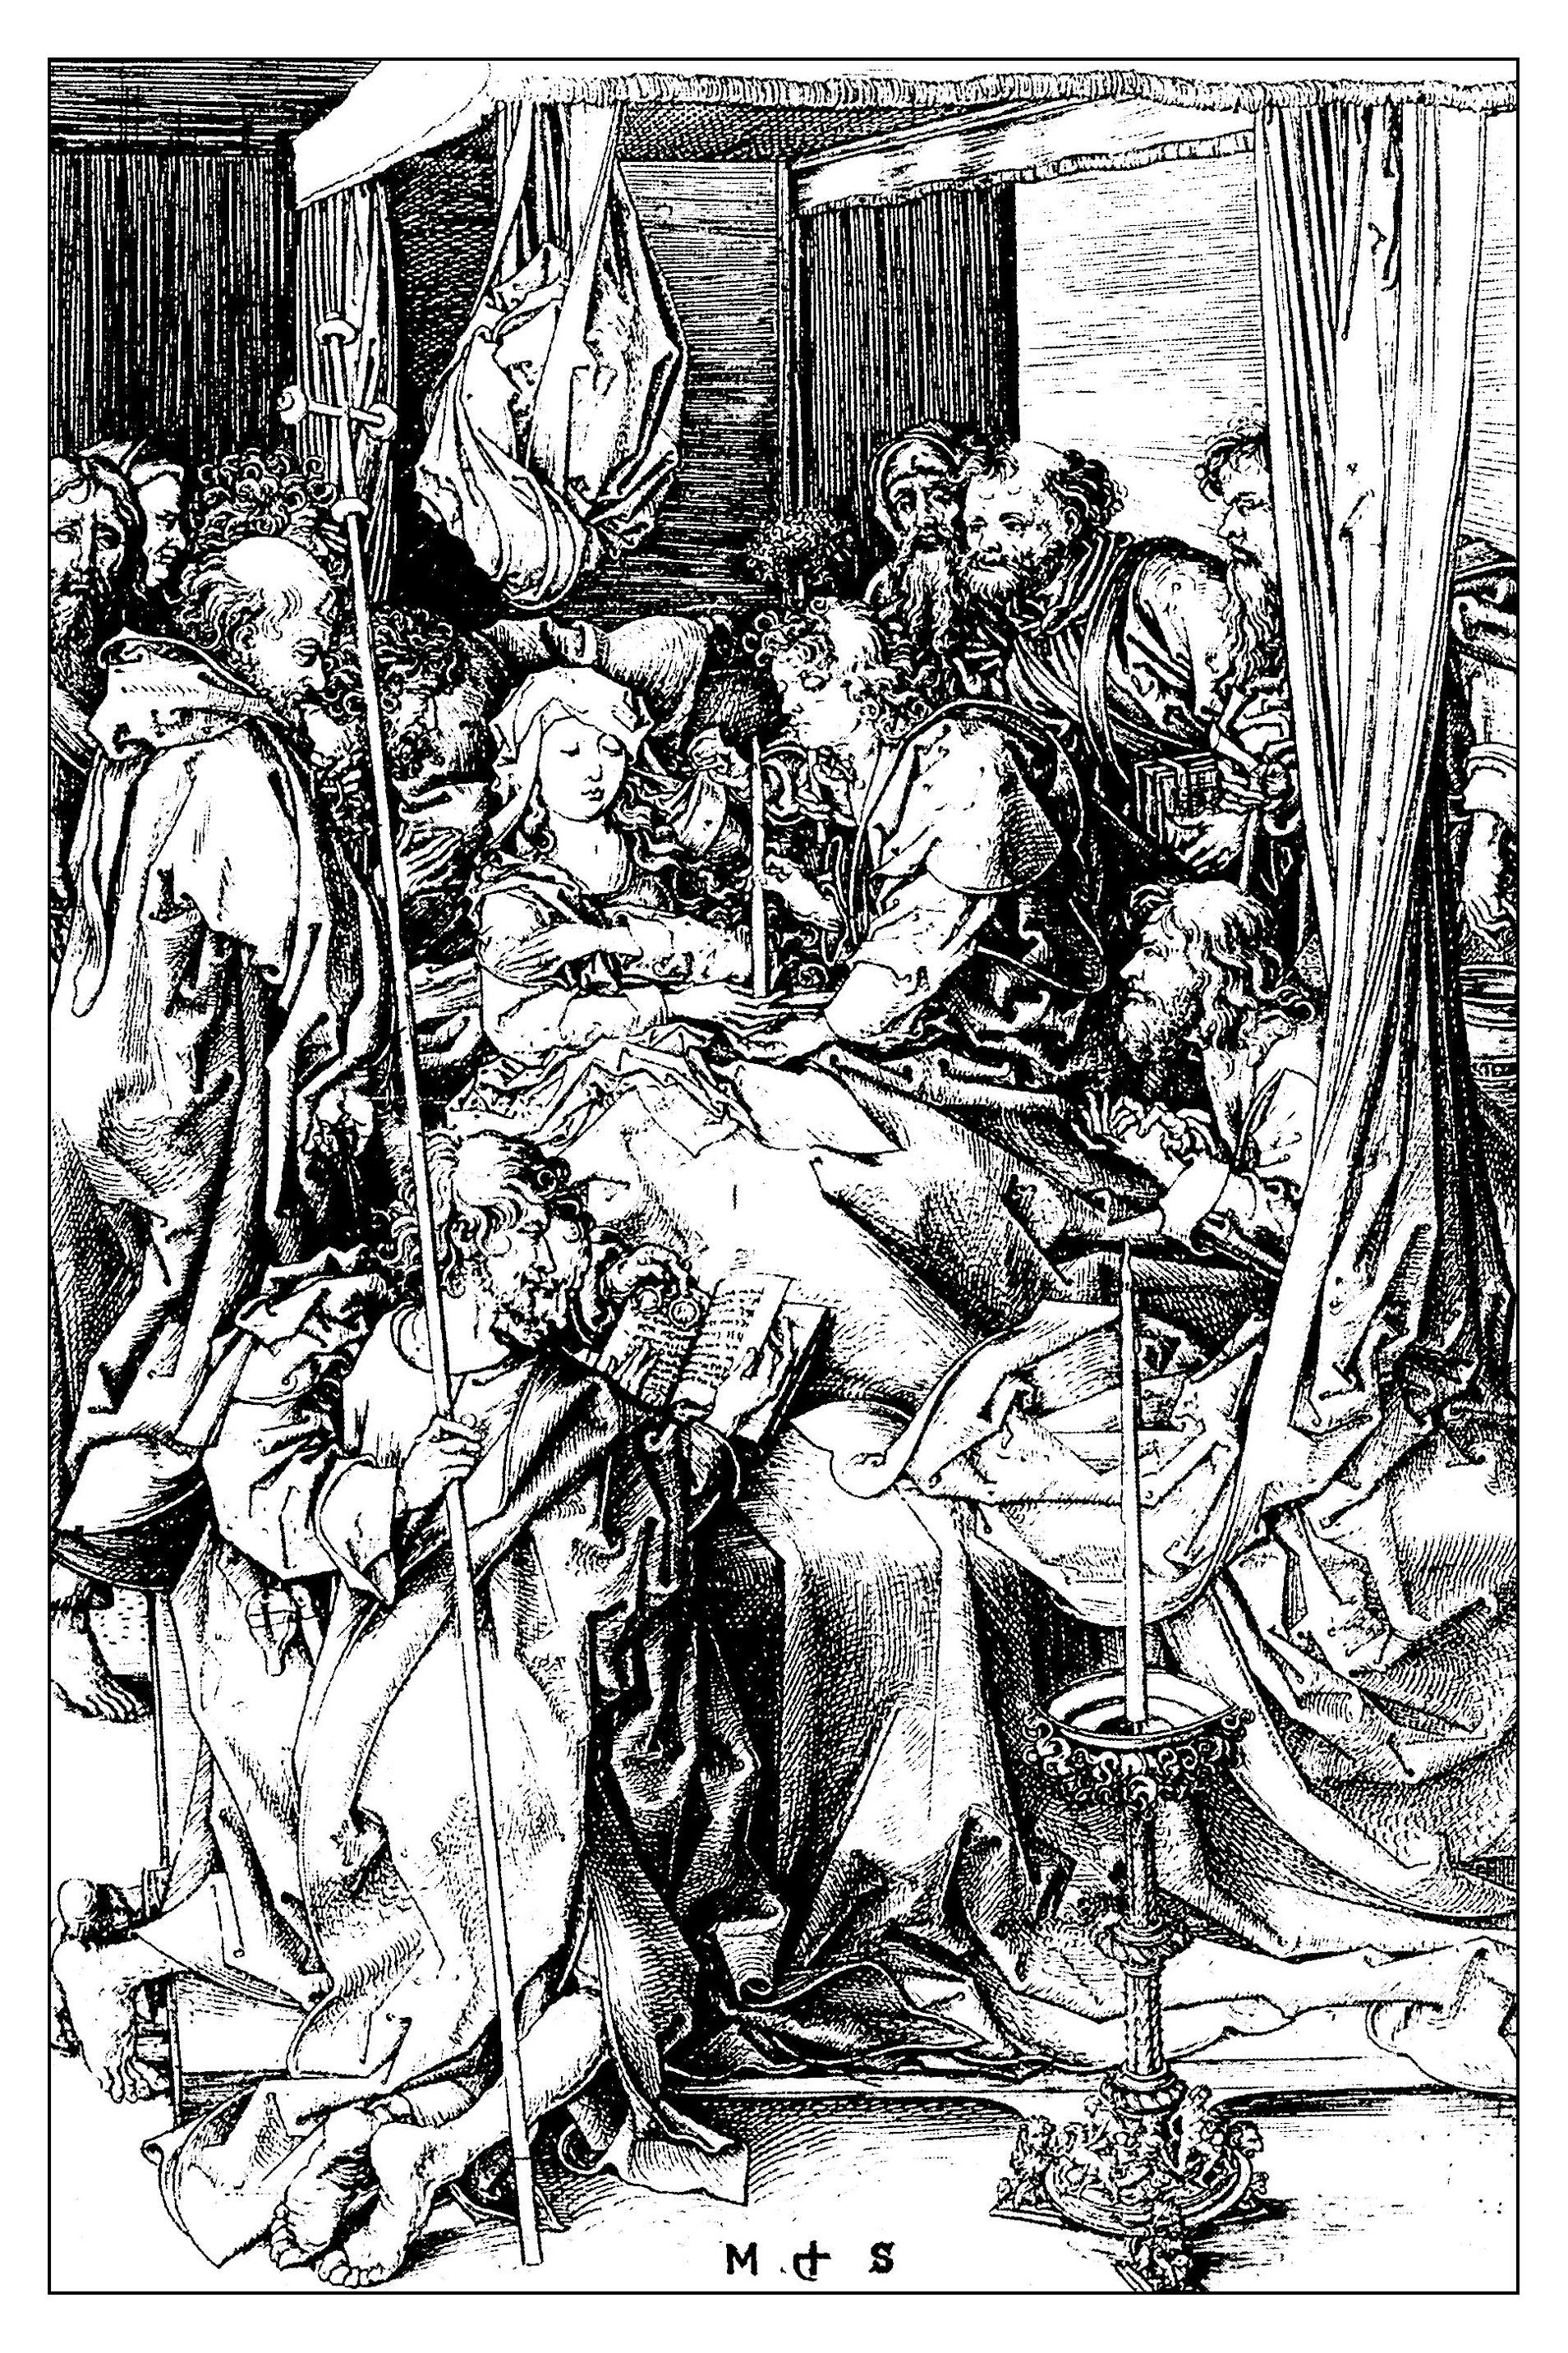 La mort de la vierge, gravure de Martin Schongauer, 1470